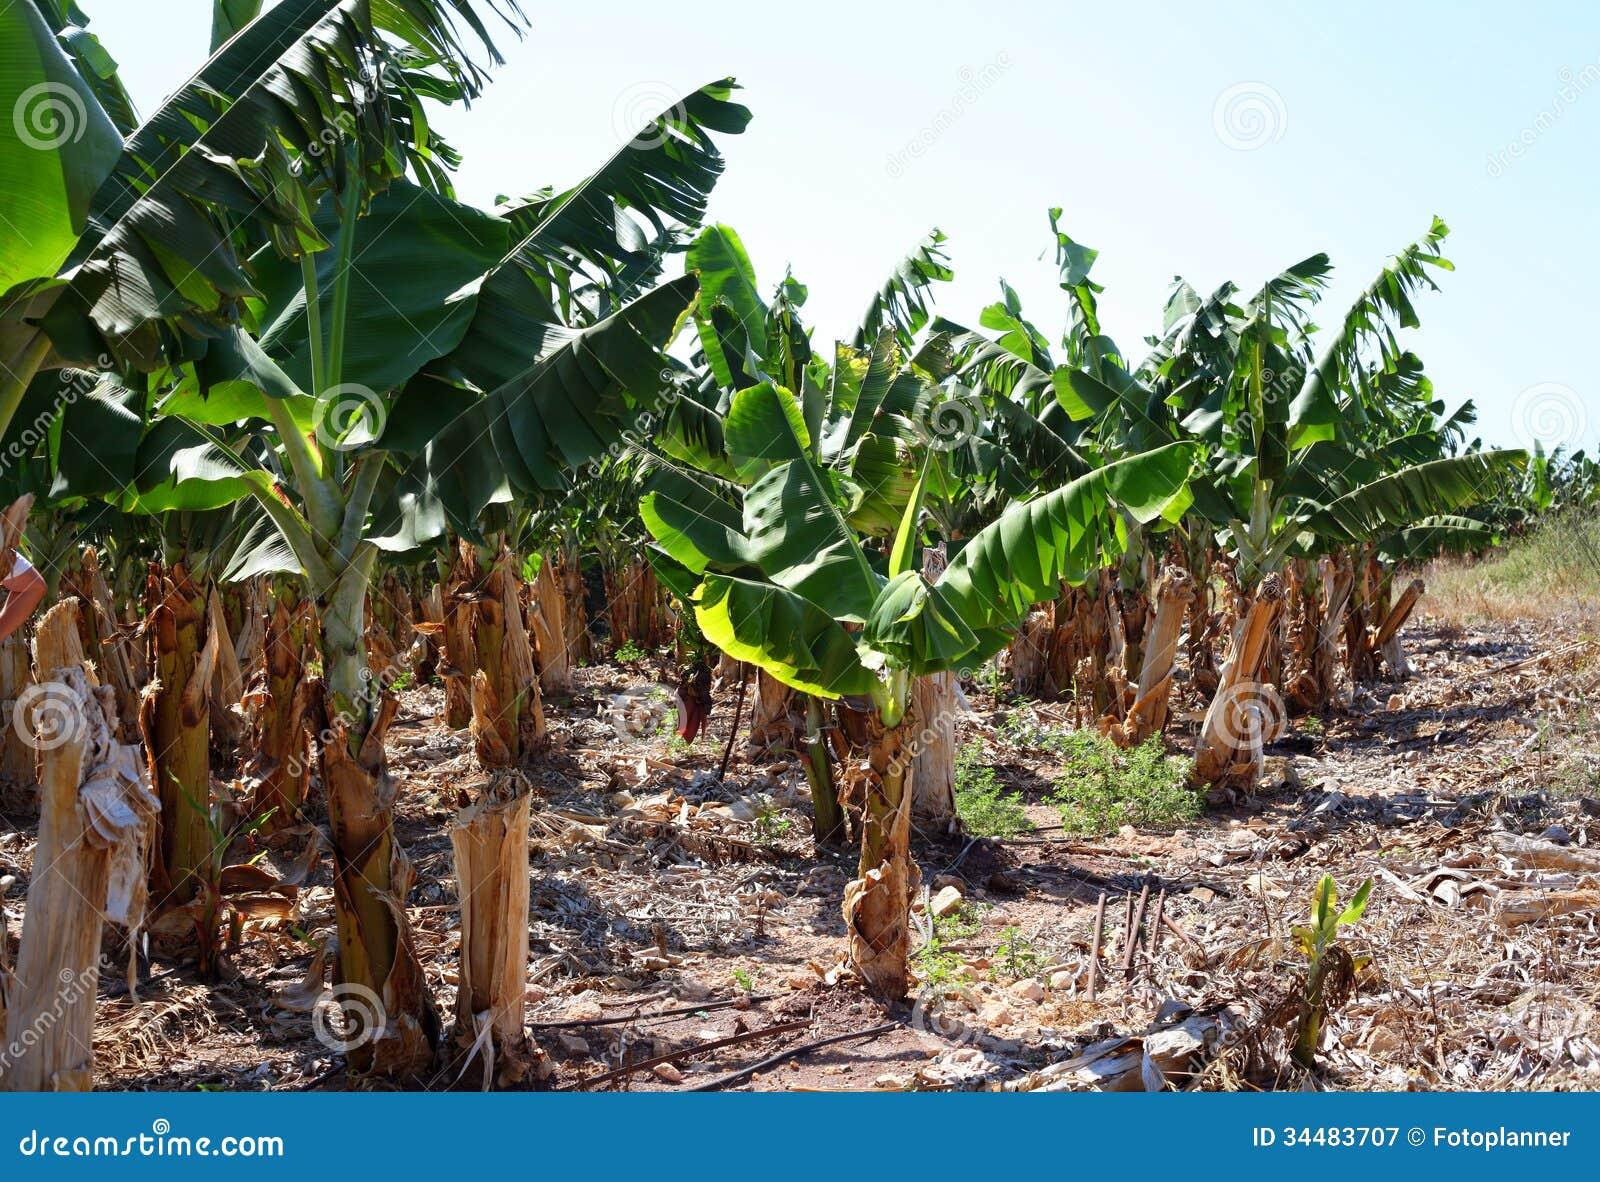 Battling to save the world's bananas